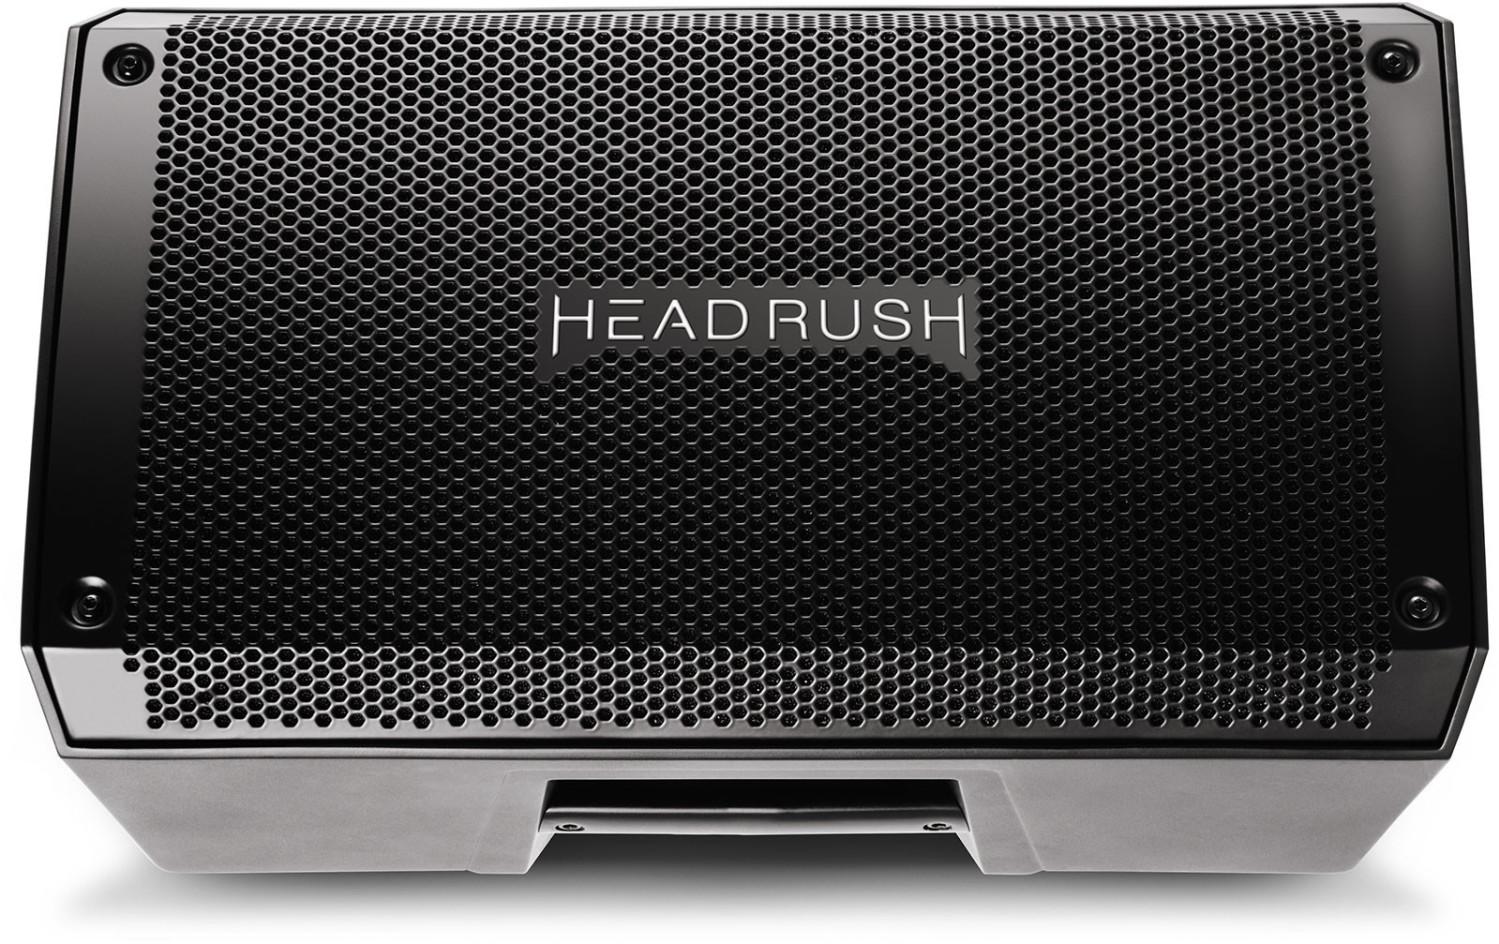 Image of Headrush FRFR-108